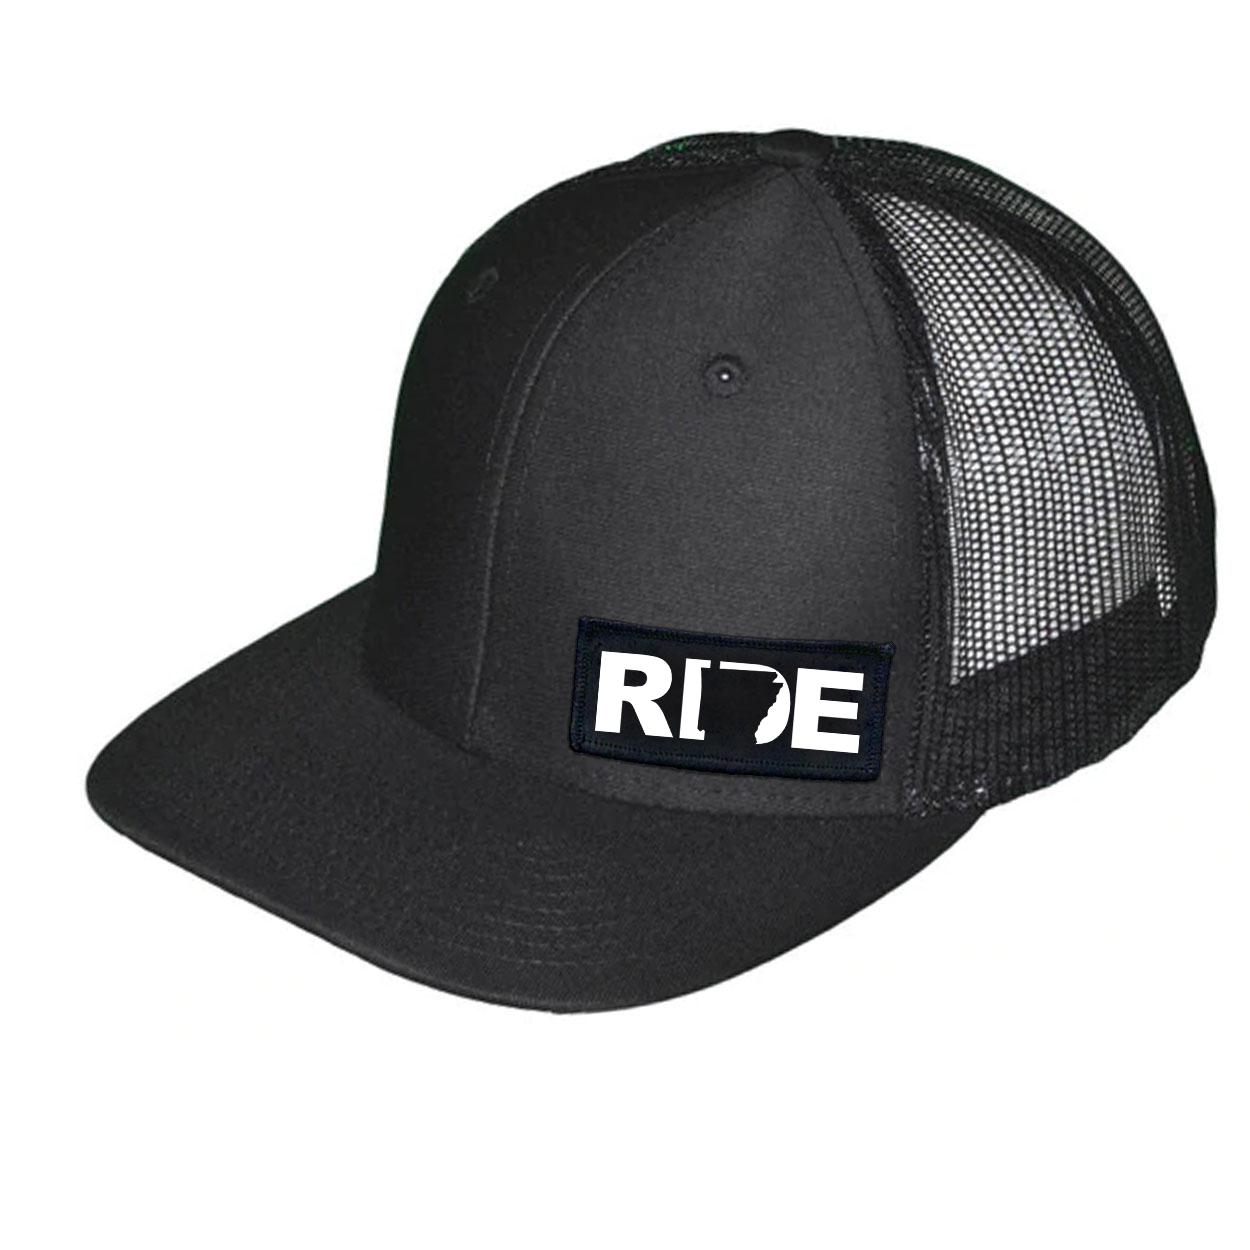 Ride Arkansas Night Out Woven Patch Snapback Trucker Hat Black (White Logo)